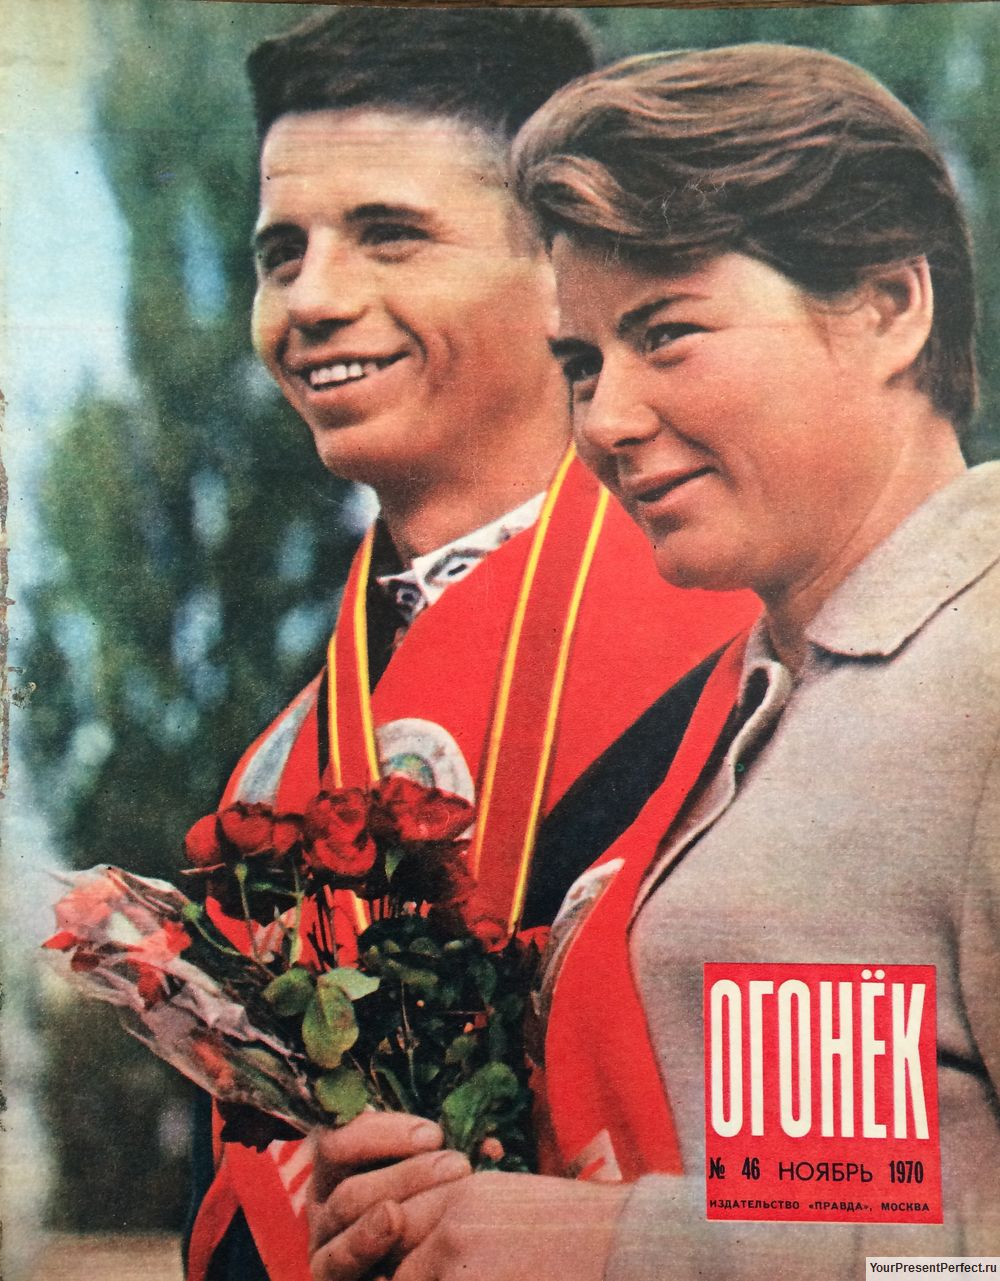 Журнал Огонек №46 ноябрь 1970